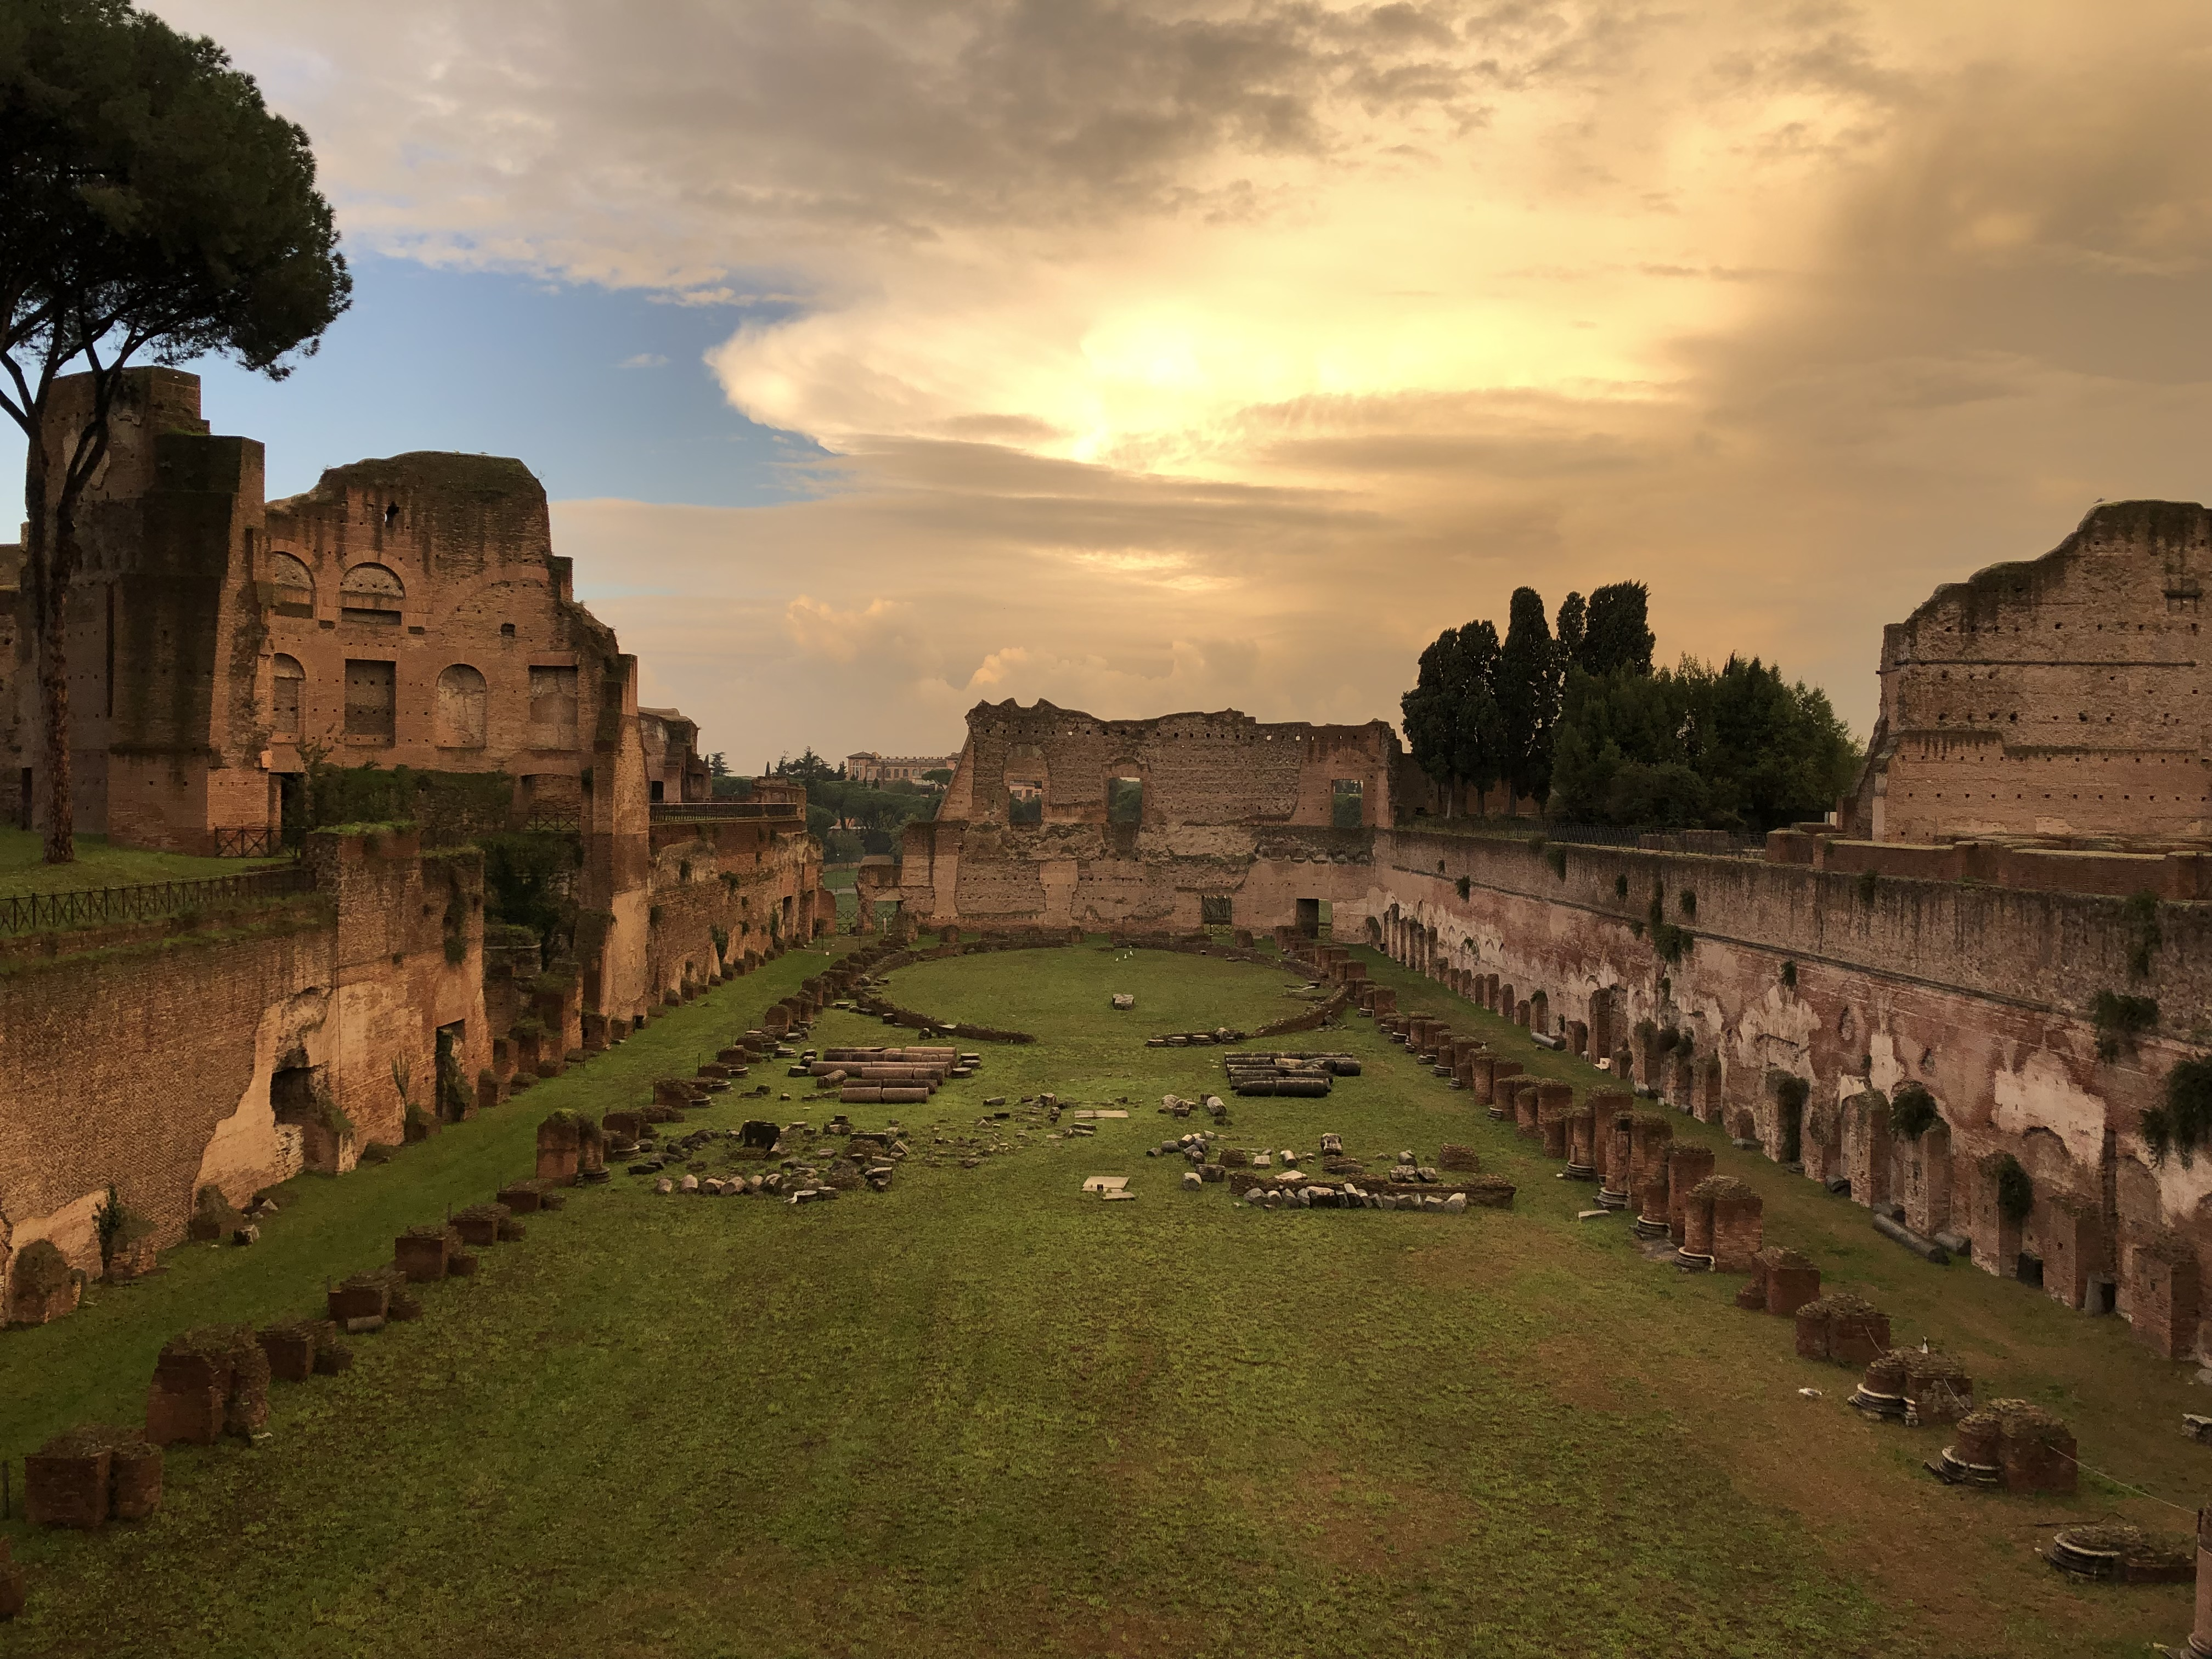 roma_palatino_Lo-Stadio-Palatino-foto-Parco-archeologico-del-Colosseo